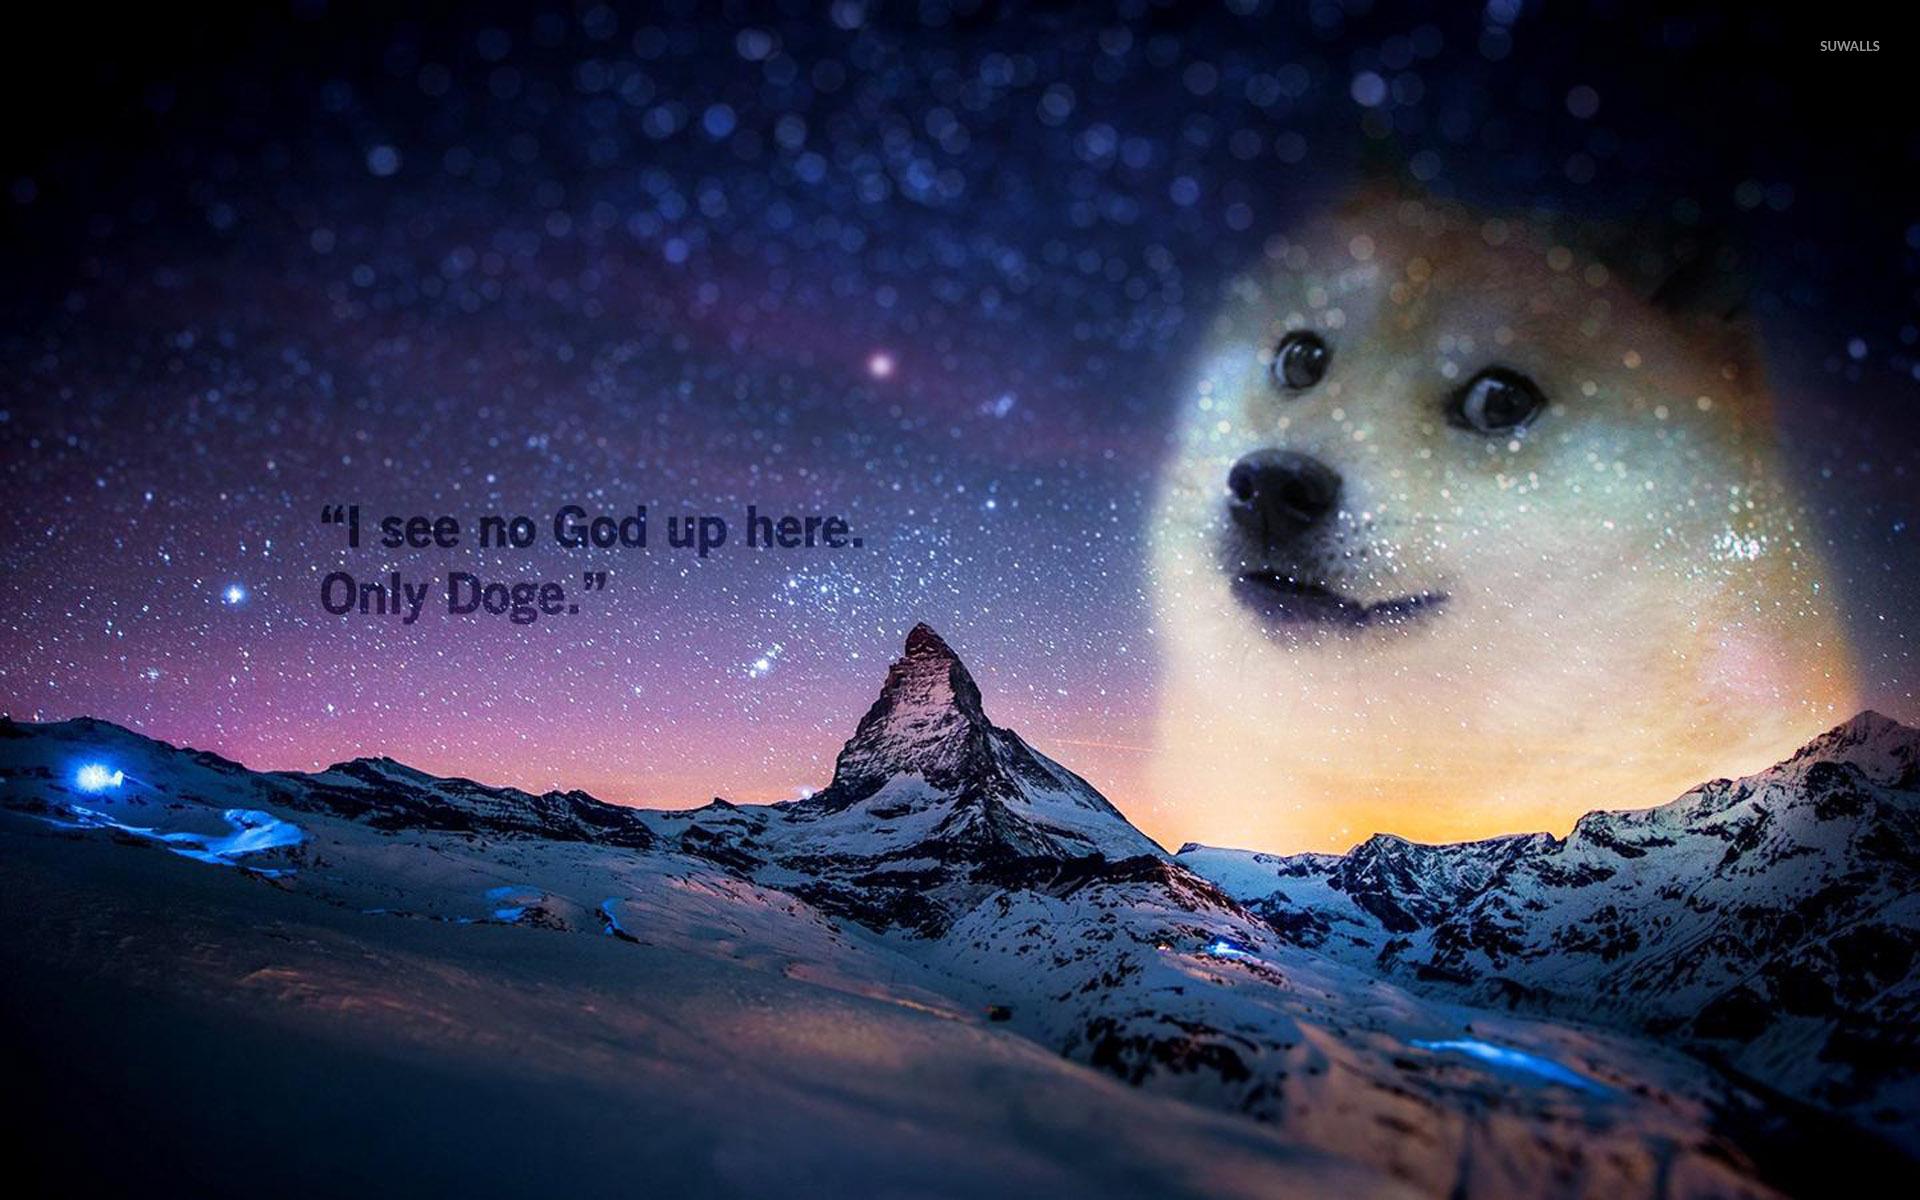 Doge wallpaper   Meme wallpapers   27299 1680x1050